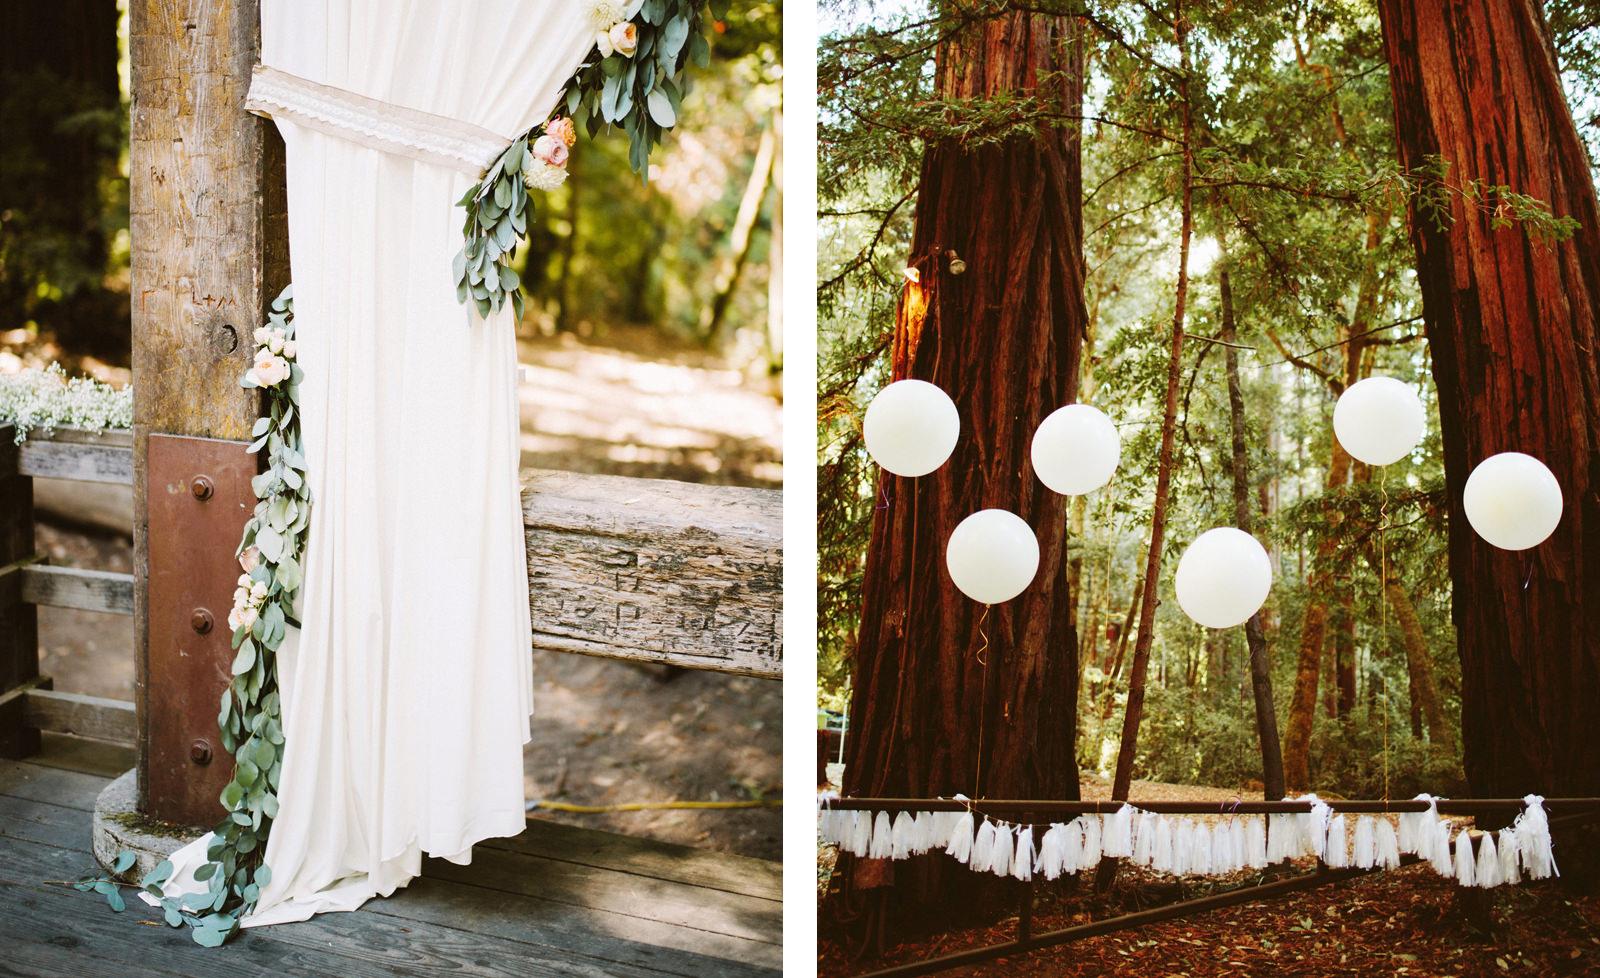 kimclay-blog-016 REDWOOD FOREST WEDDING